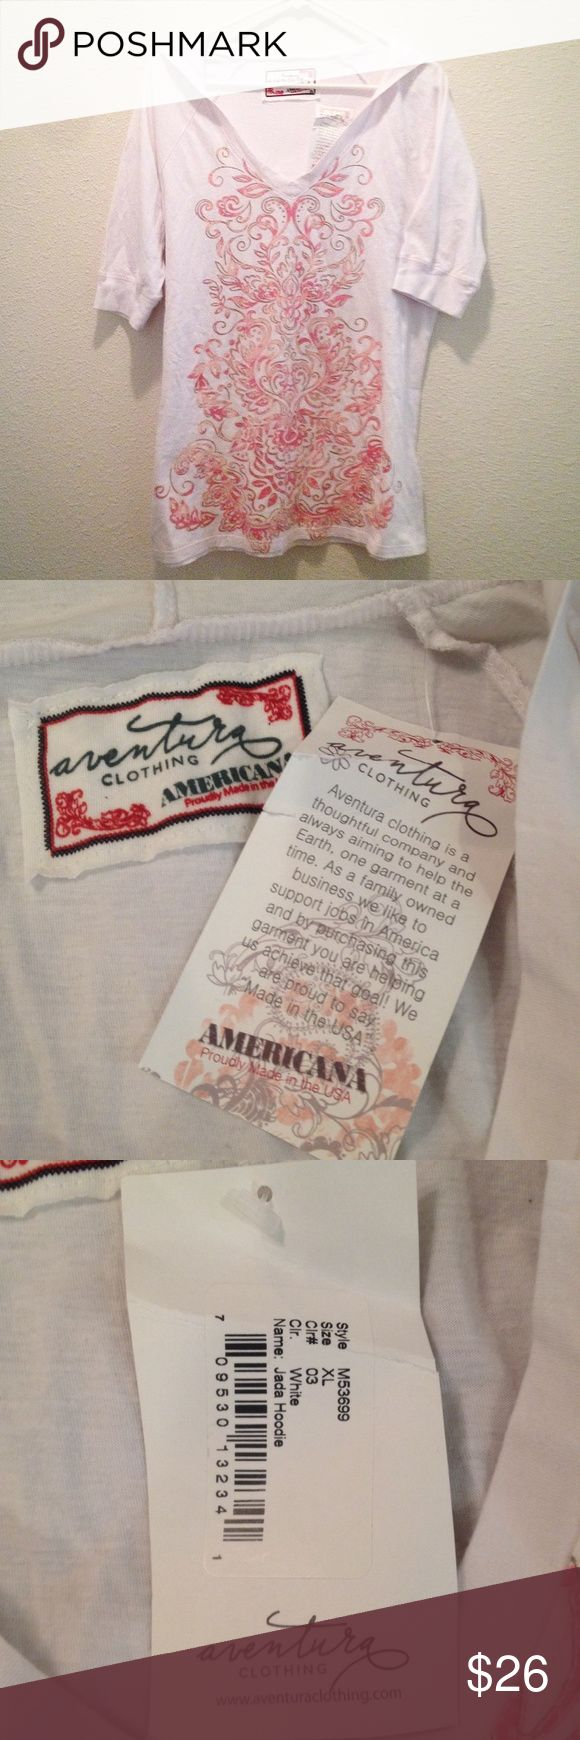 Aventura Clothing Short Sleeve Hoodie White Pink White and pink short sleeve hoodie NWT Aventura Clothing organic cotton. Green friendly! XL Aventura Clothing Tops Sweatshirts & Hoodies